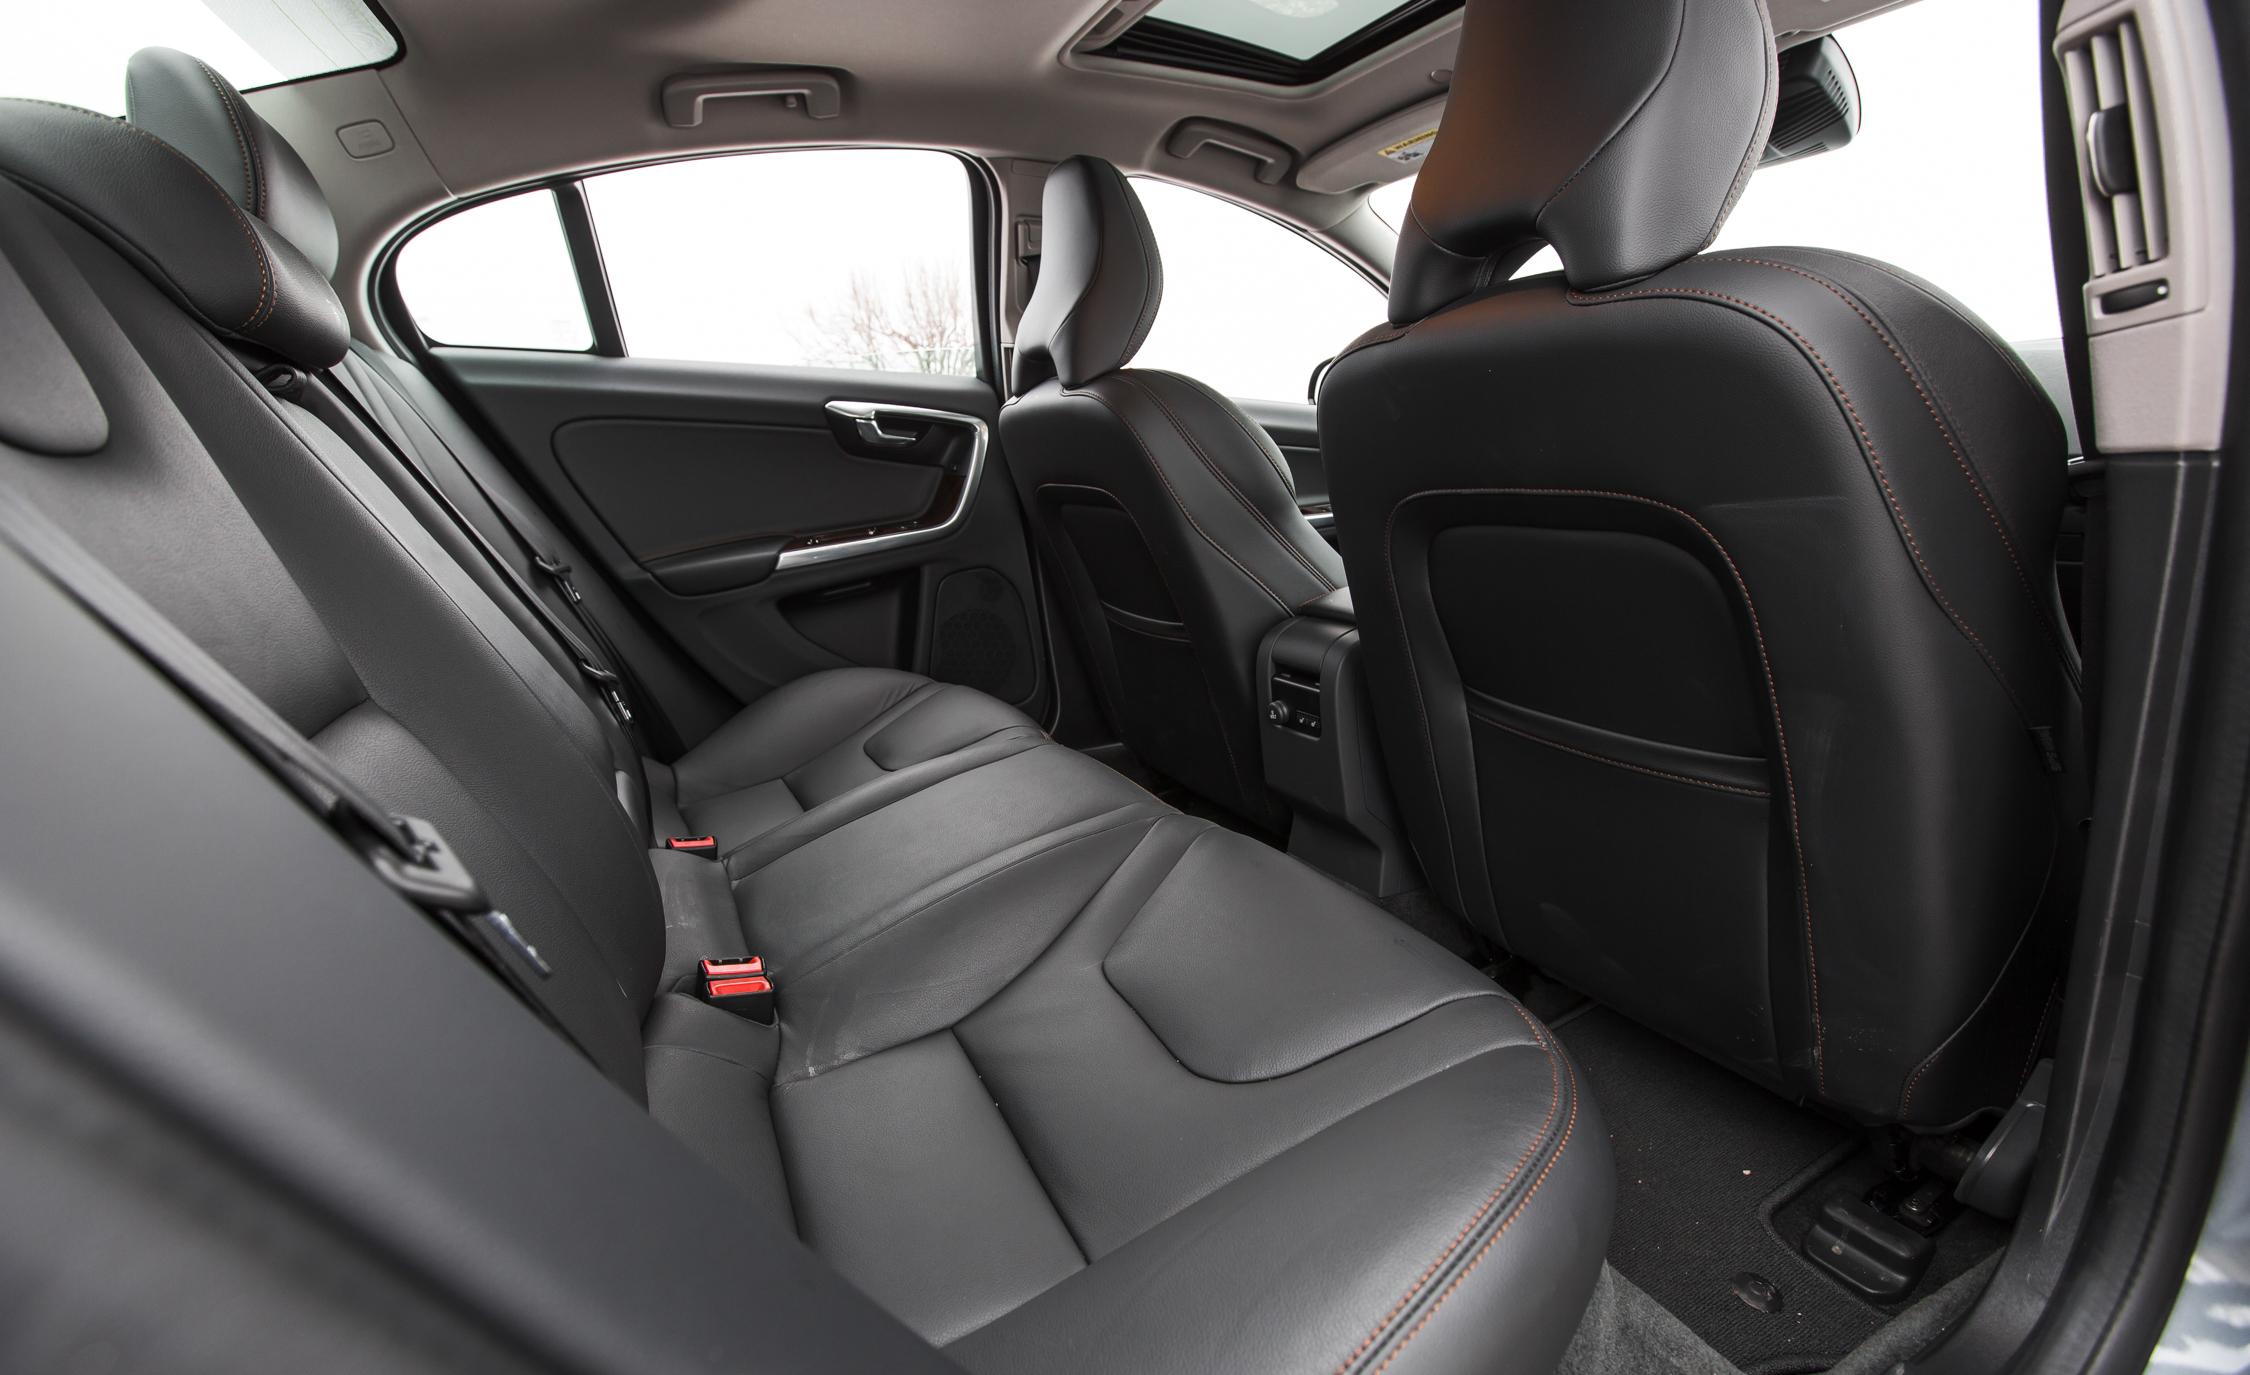 2016 Volvo S60 Cross Country Interior Rear